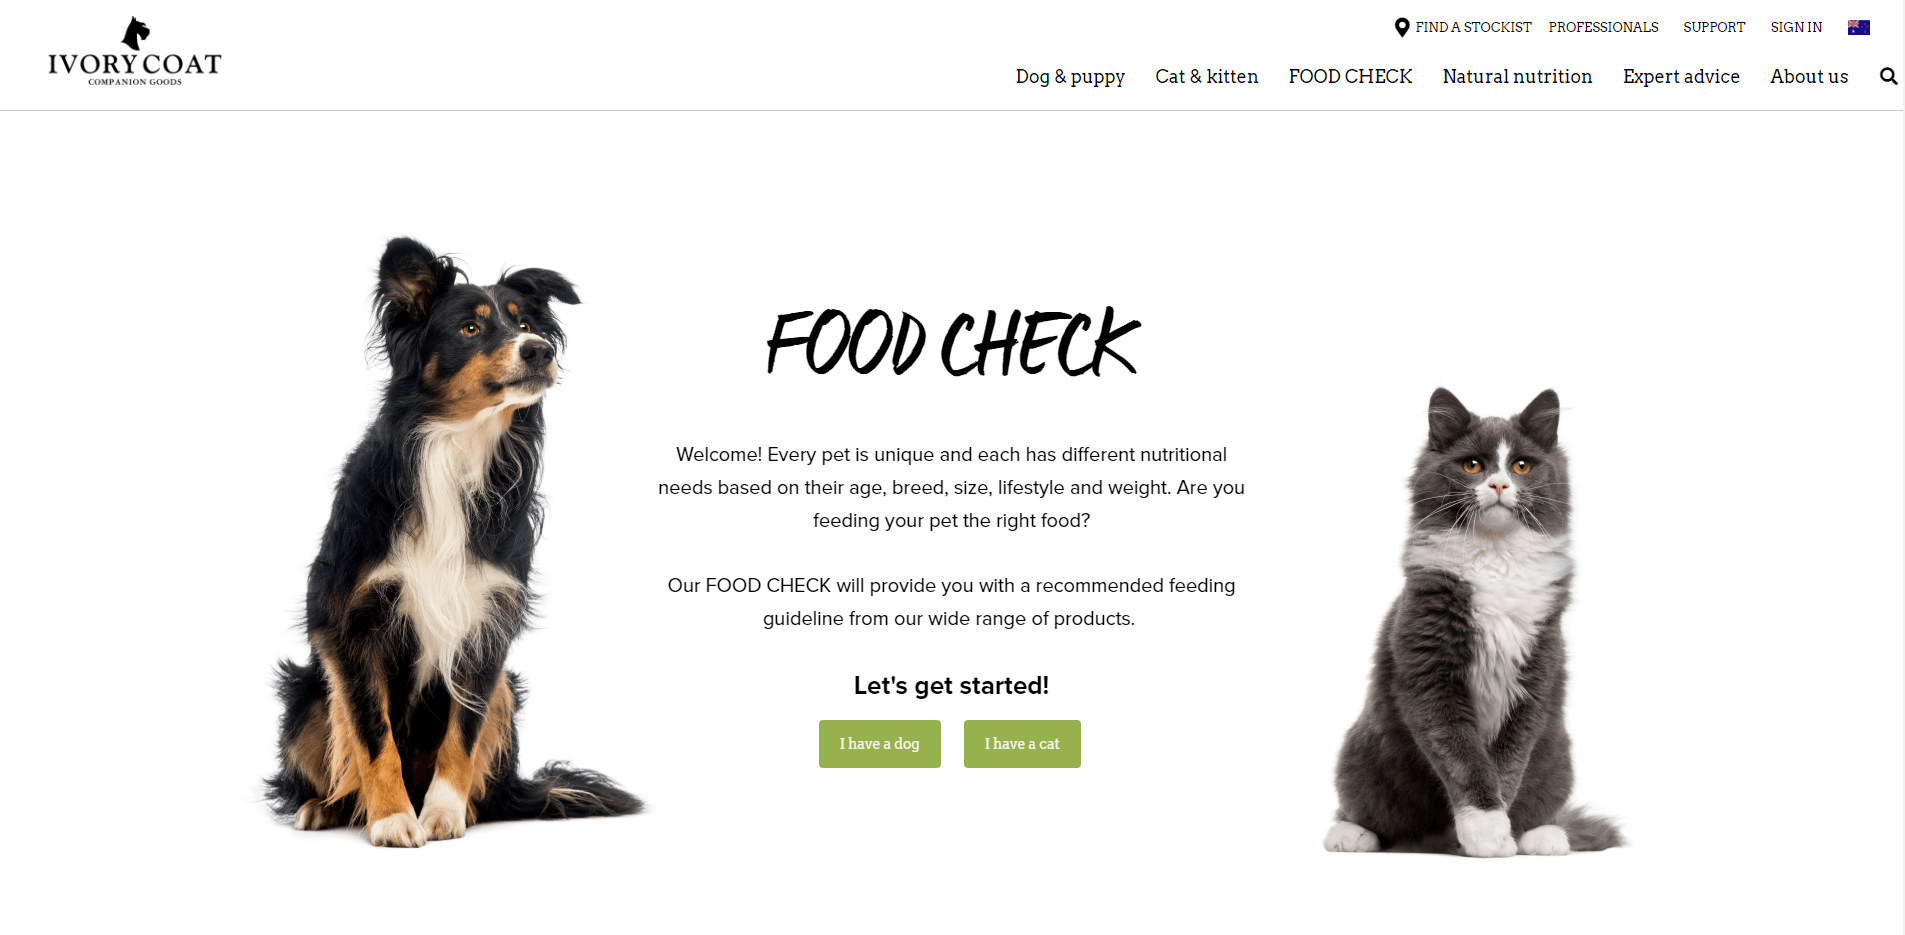 foodcheck001